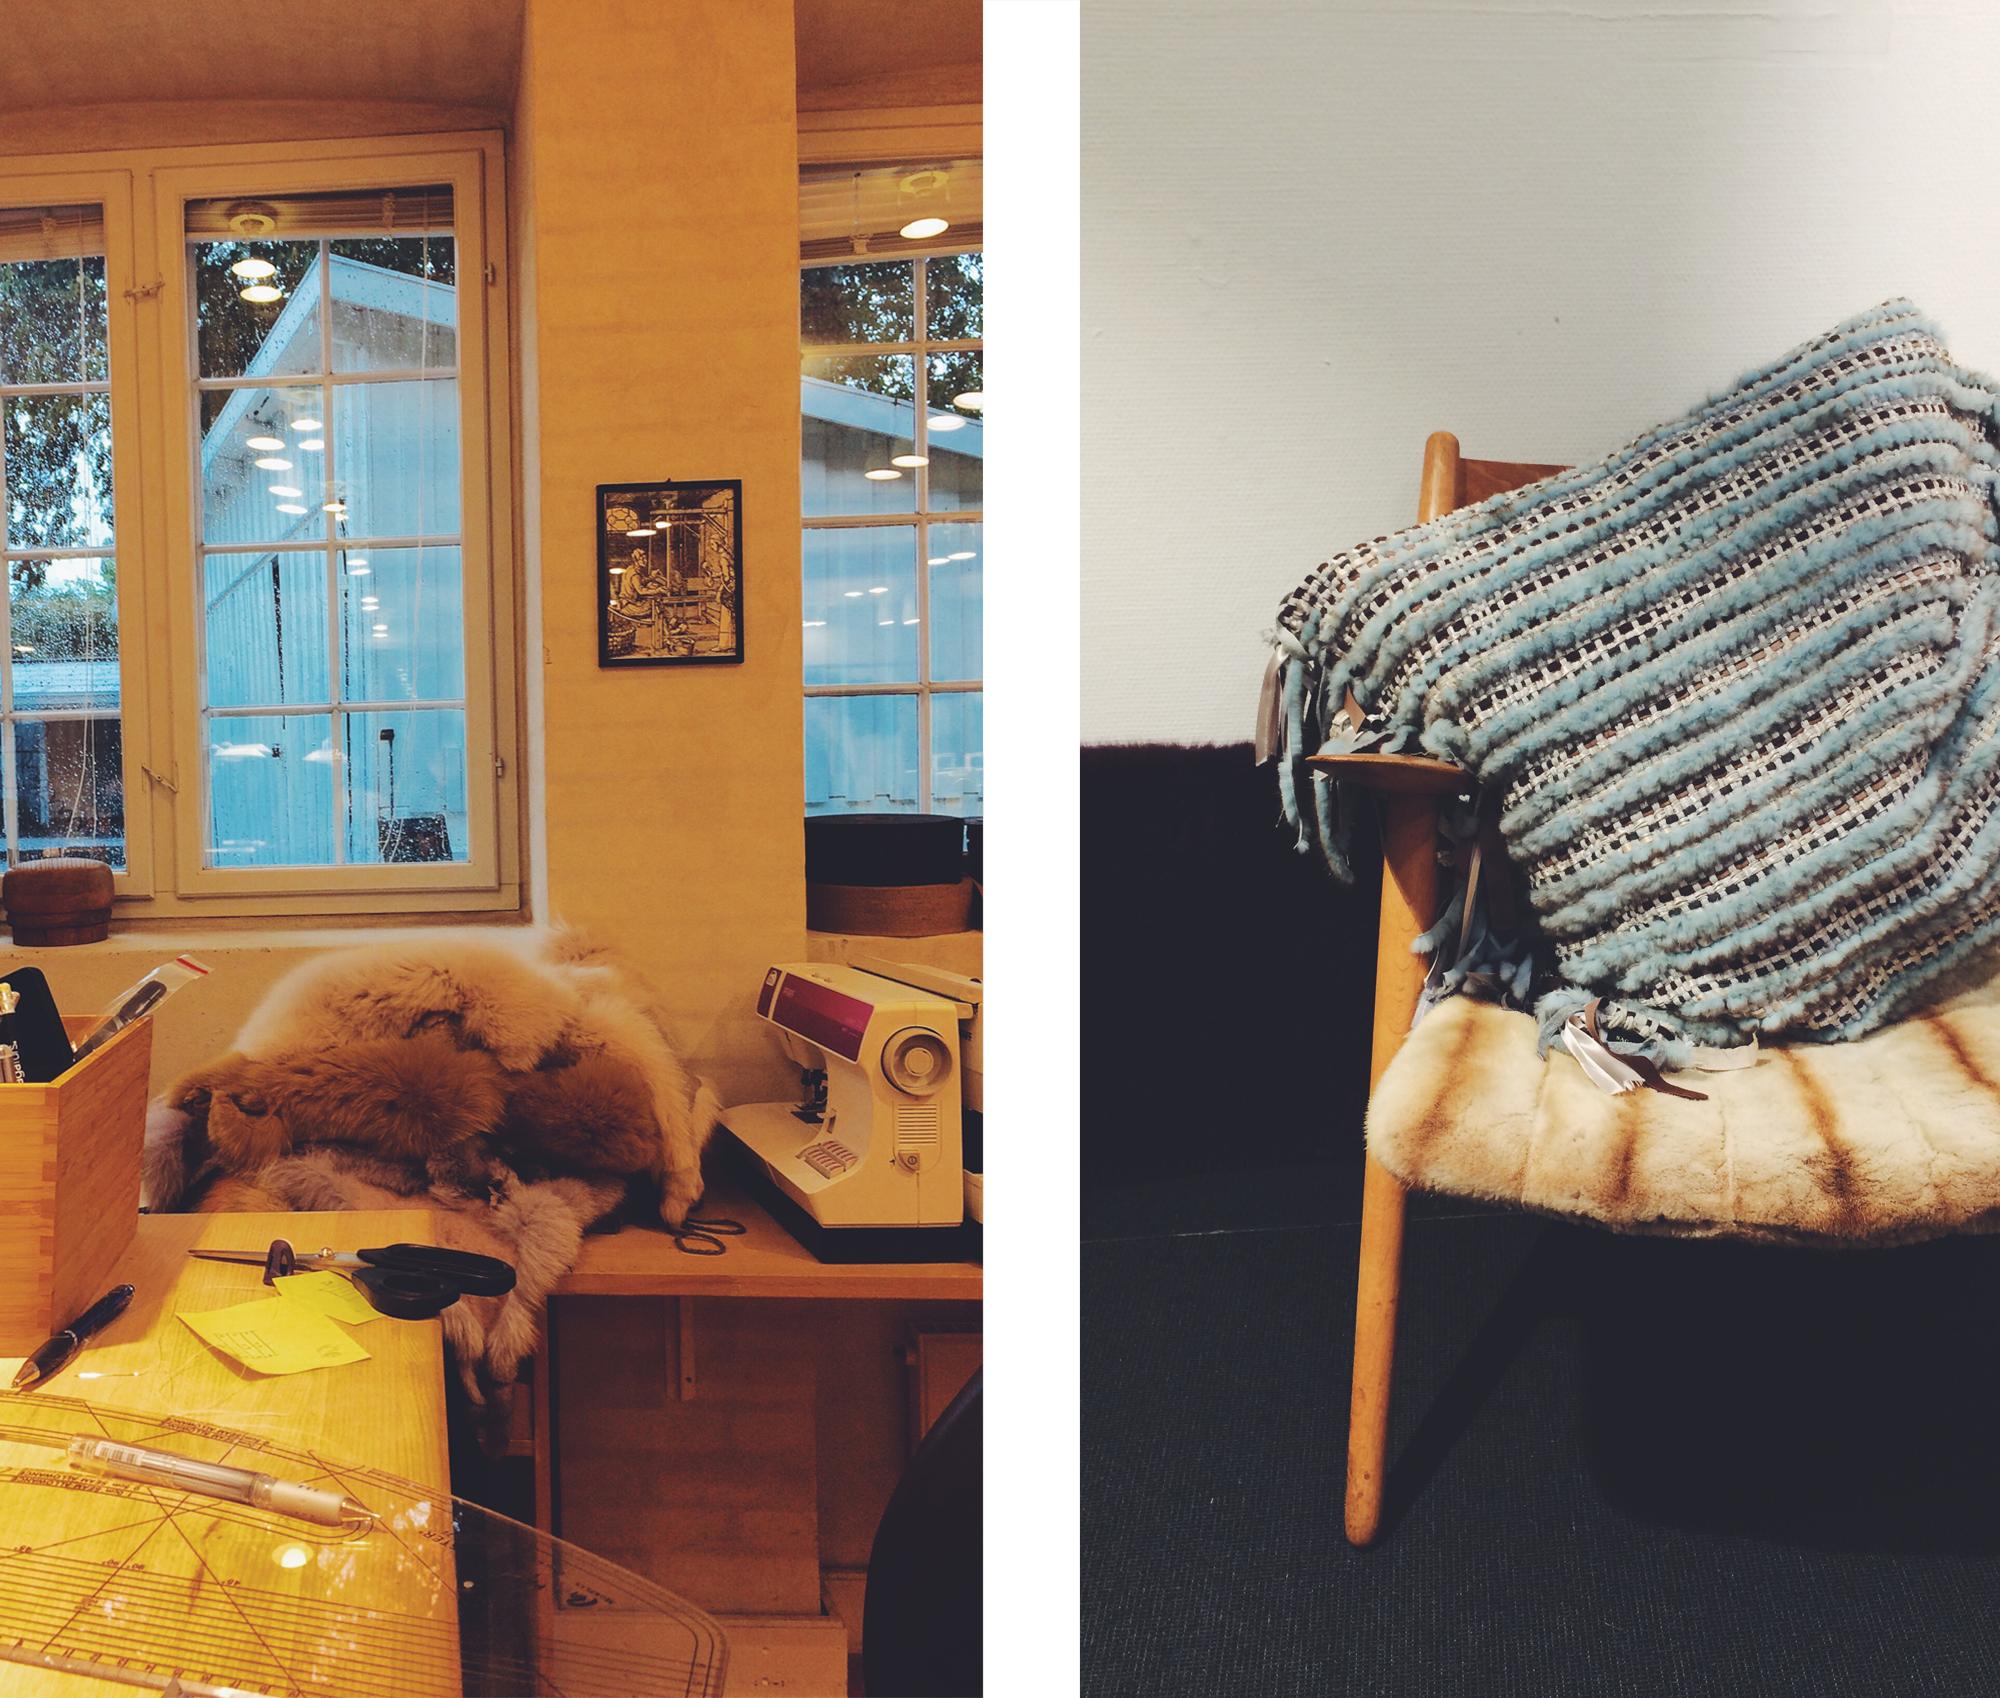 saga furs, saga furs design centre, fur, denmark, new designers, furriers, inspiration